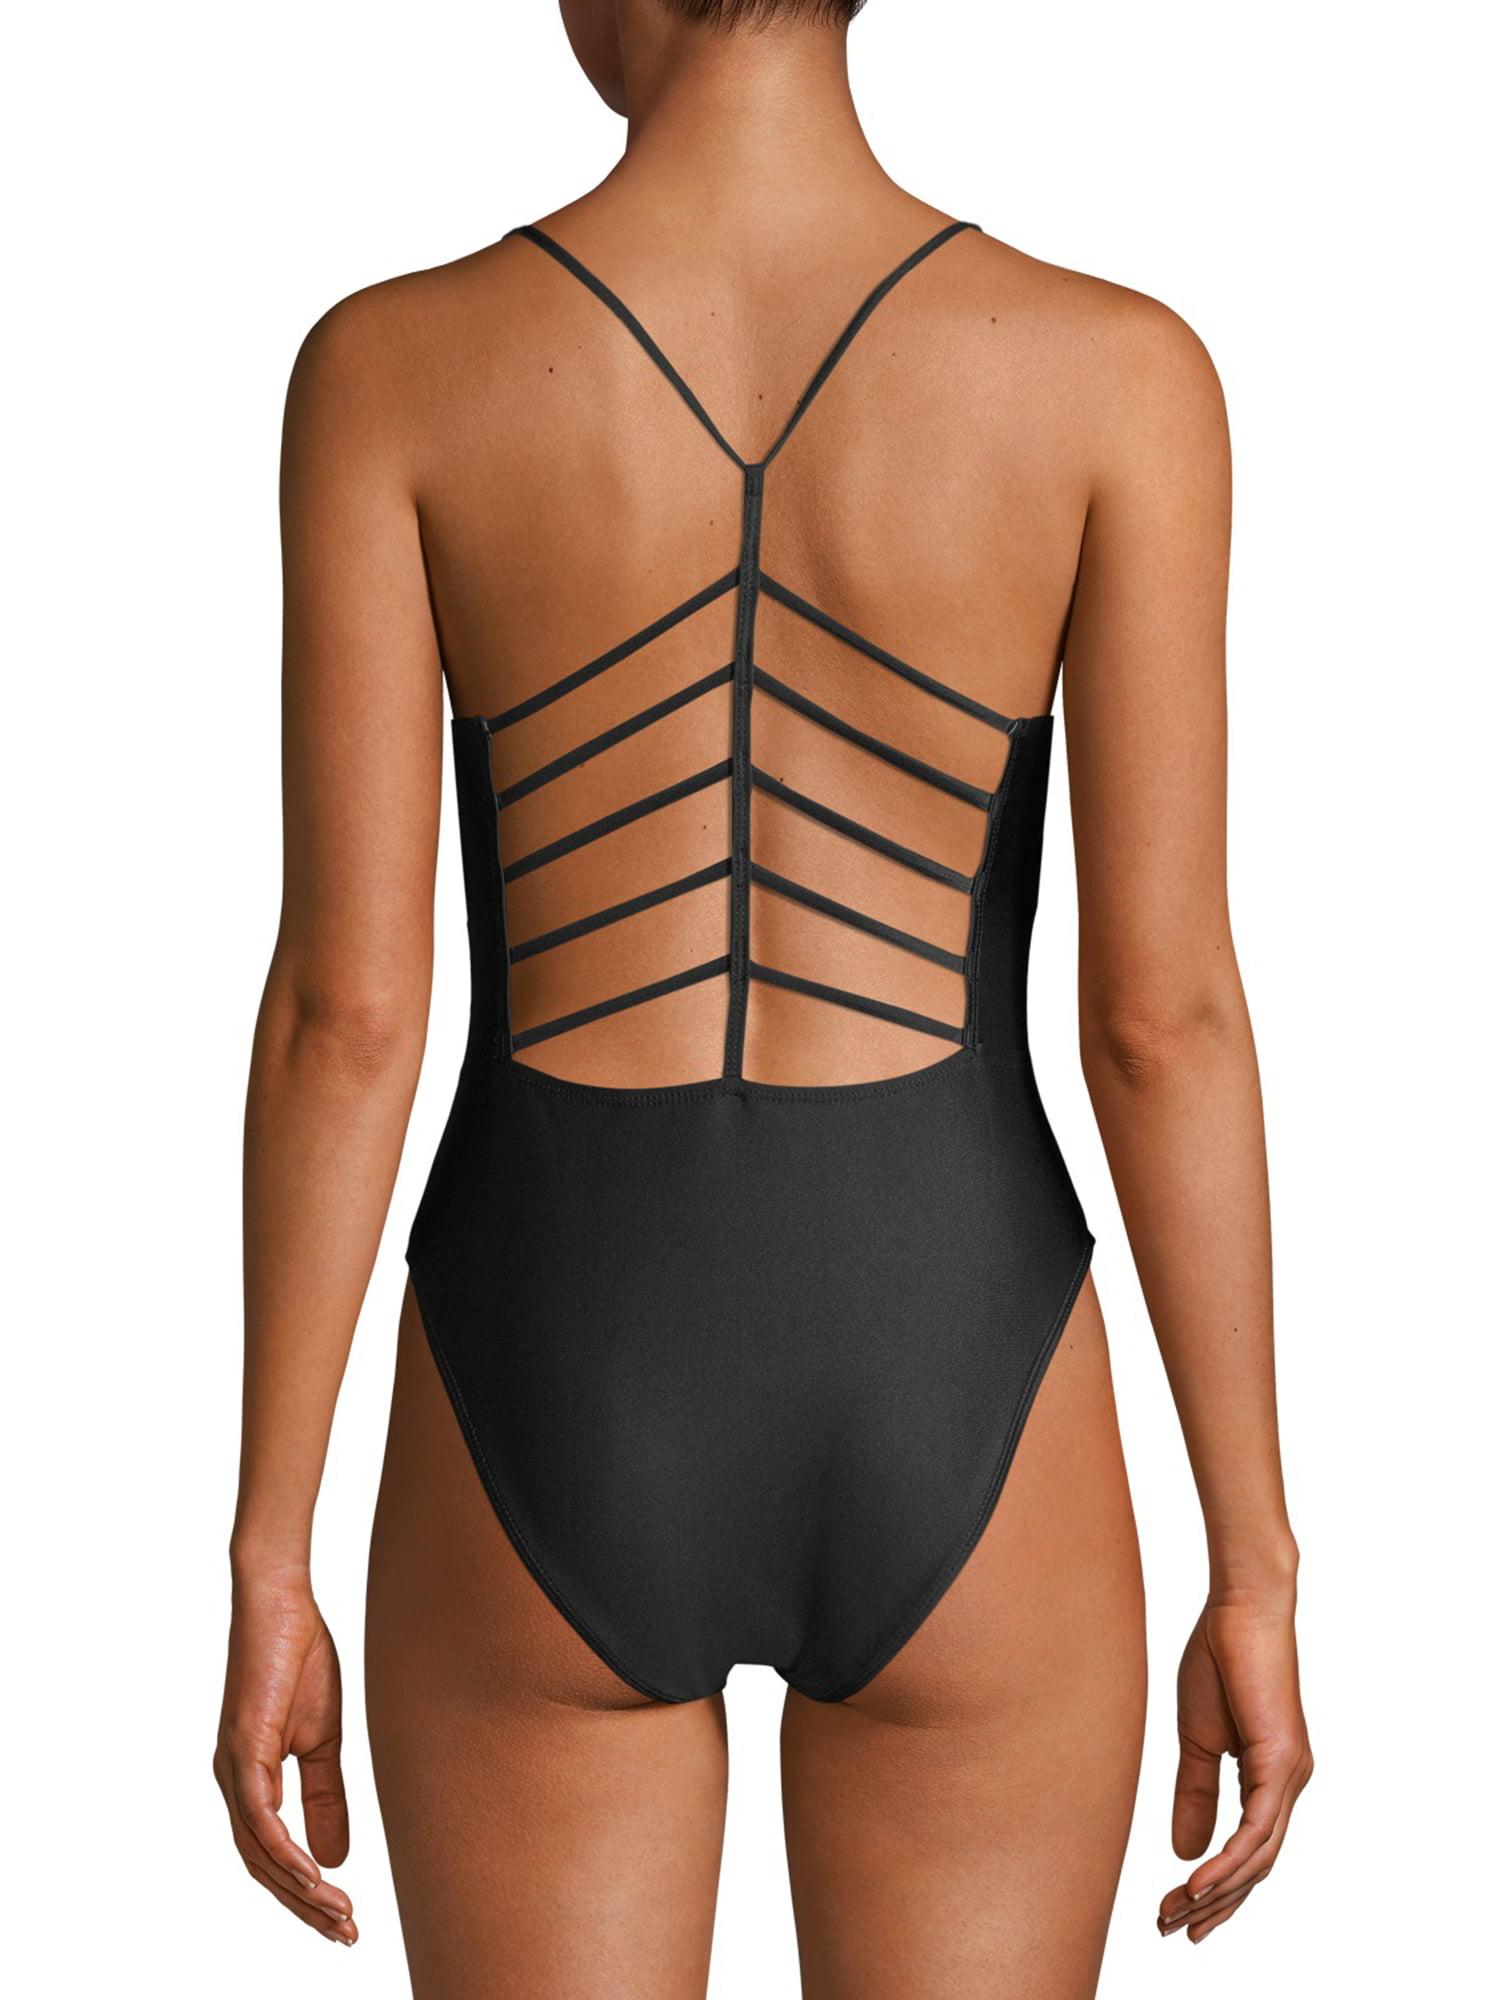 YMI Womens One-Piece Strappy Back Swimsuit